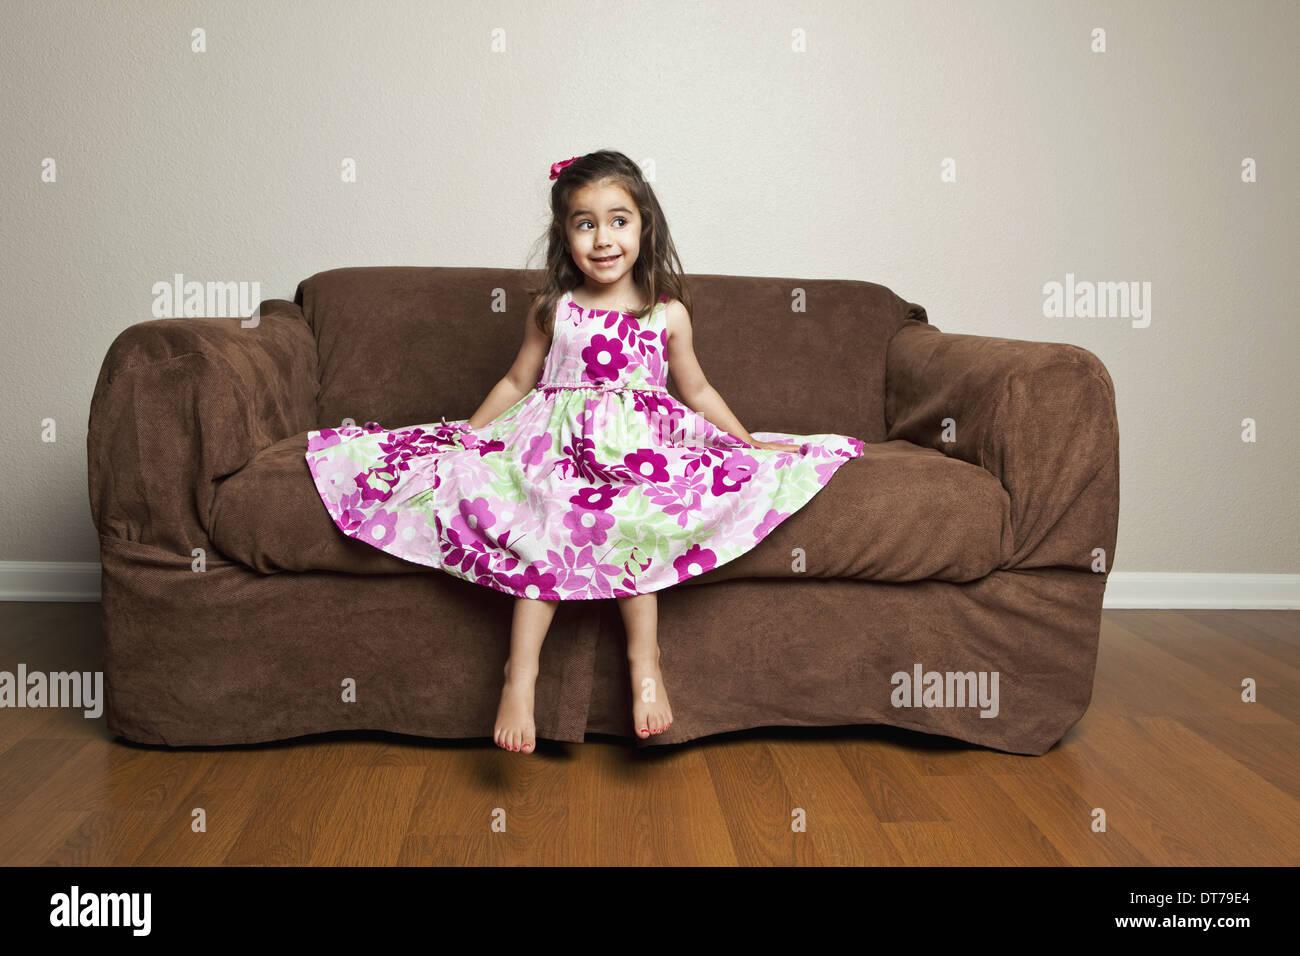 Cotton Skirt Stock Photos Amp Cotton Skirt Stock Images Alamy